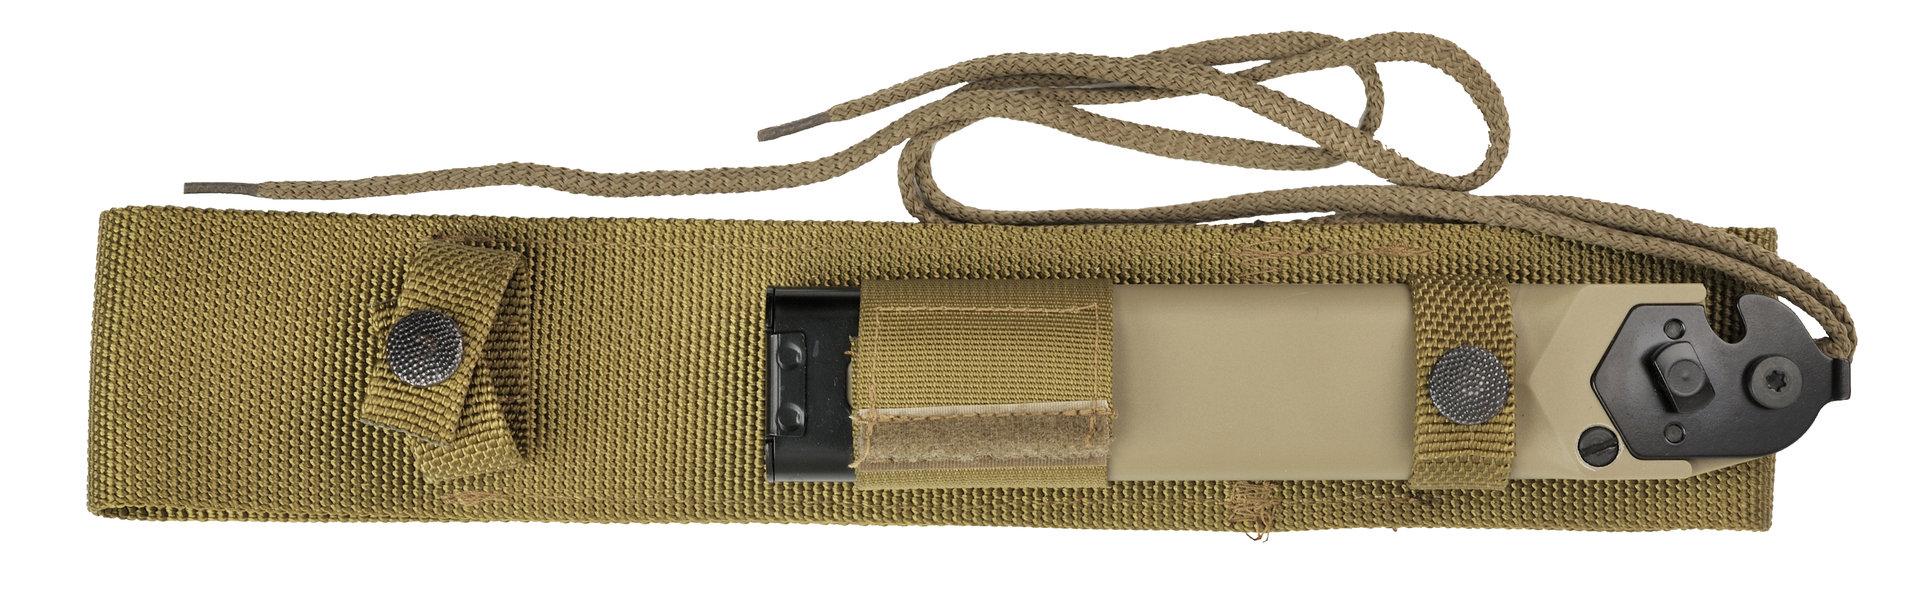 B2005-MAL FN